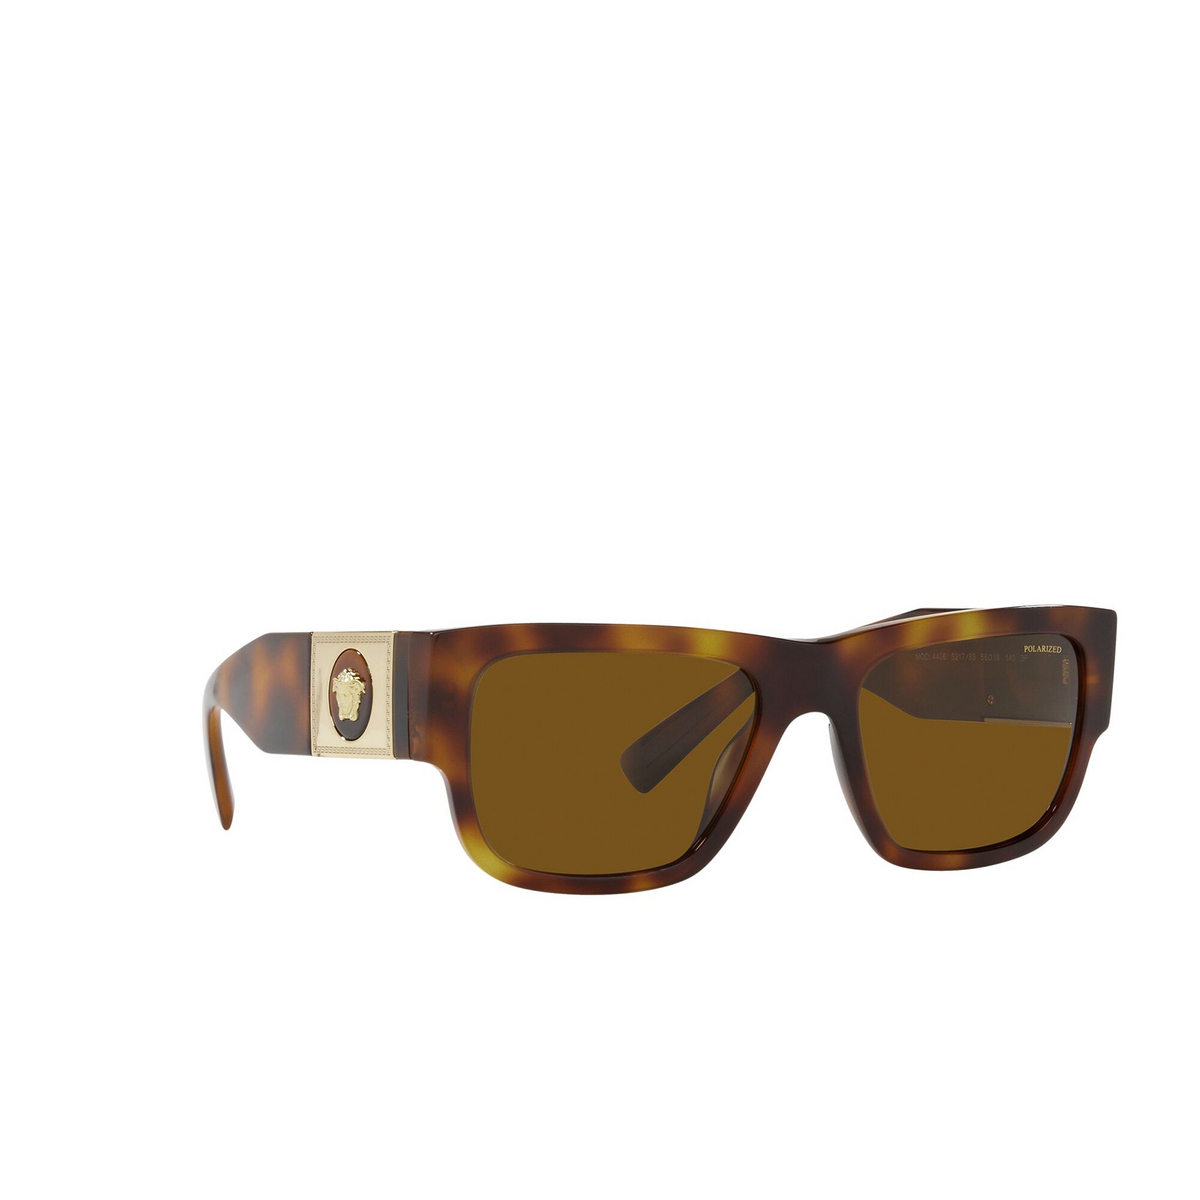 Versace® Rectangle Sunglasses: VE4406 color Havana 521783 - three-quarters view.